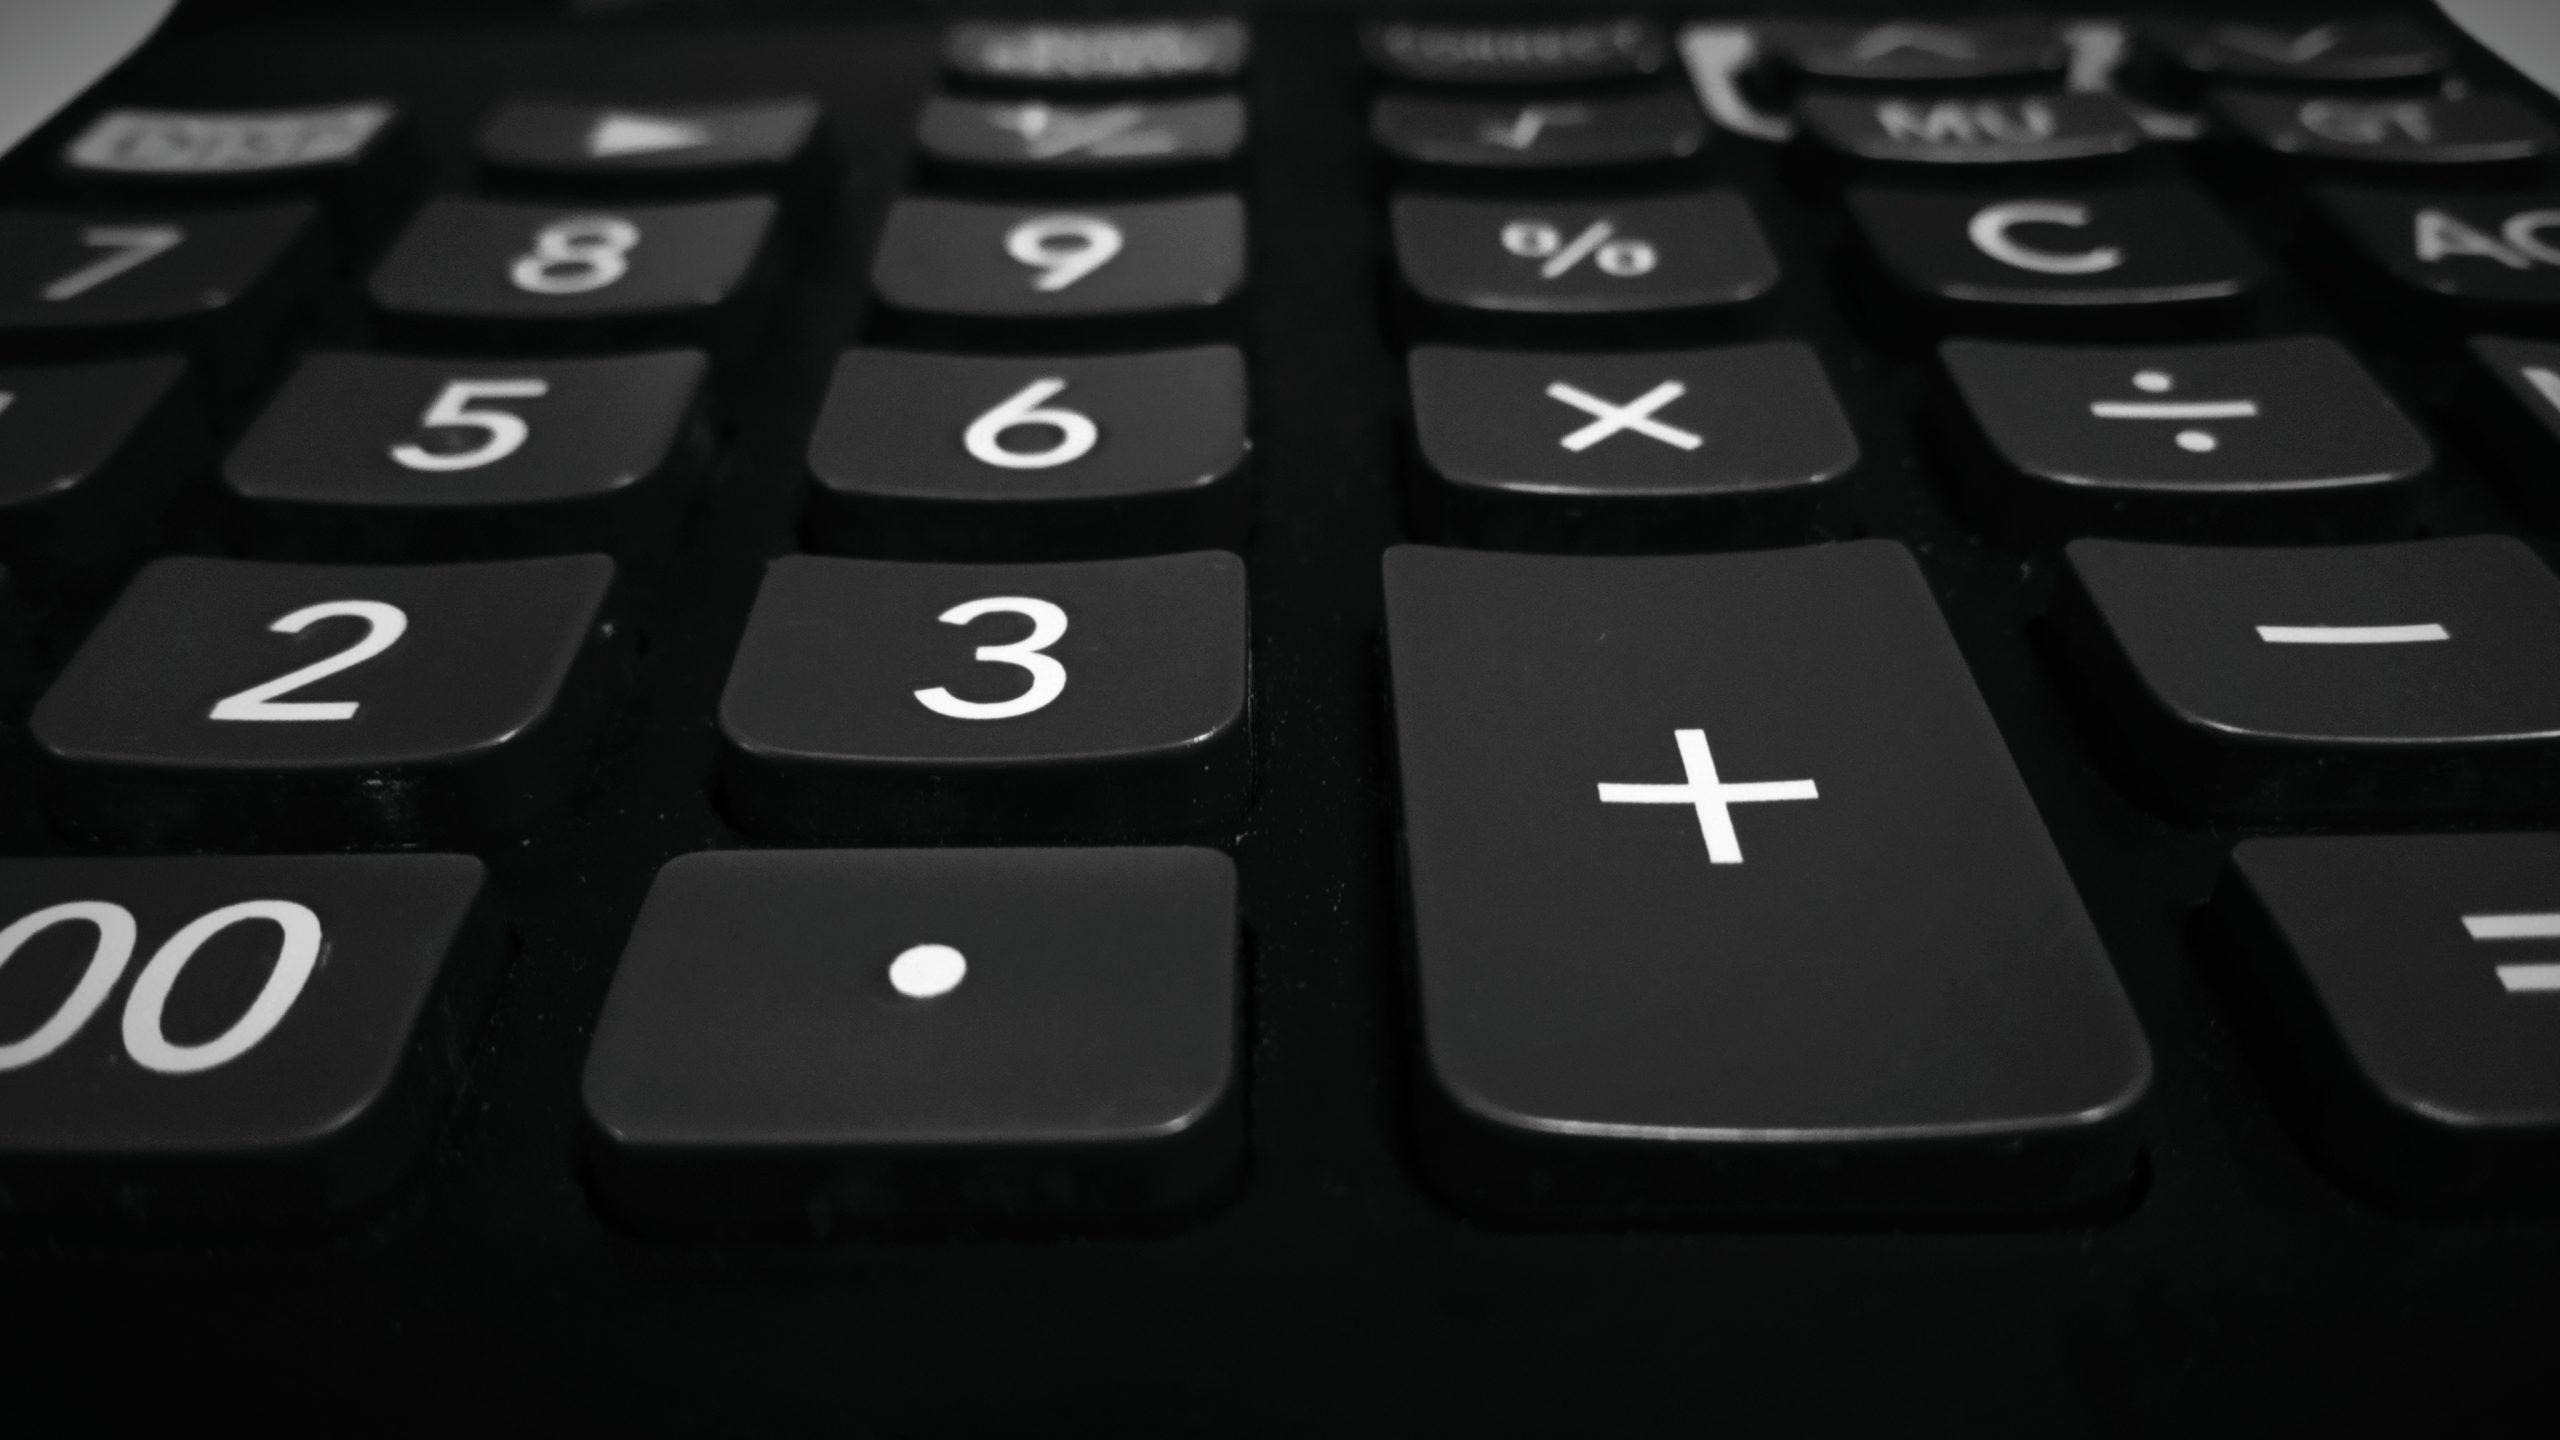 Keypad of a calculator